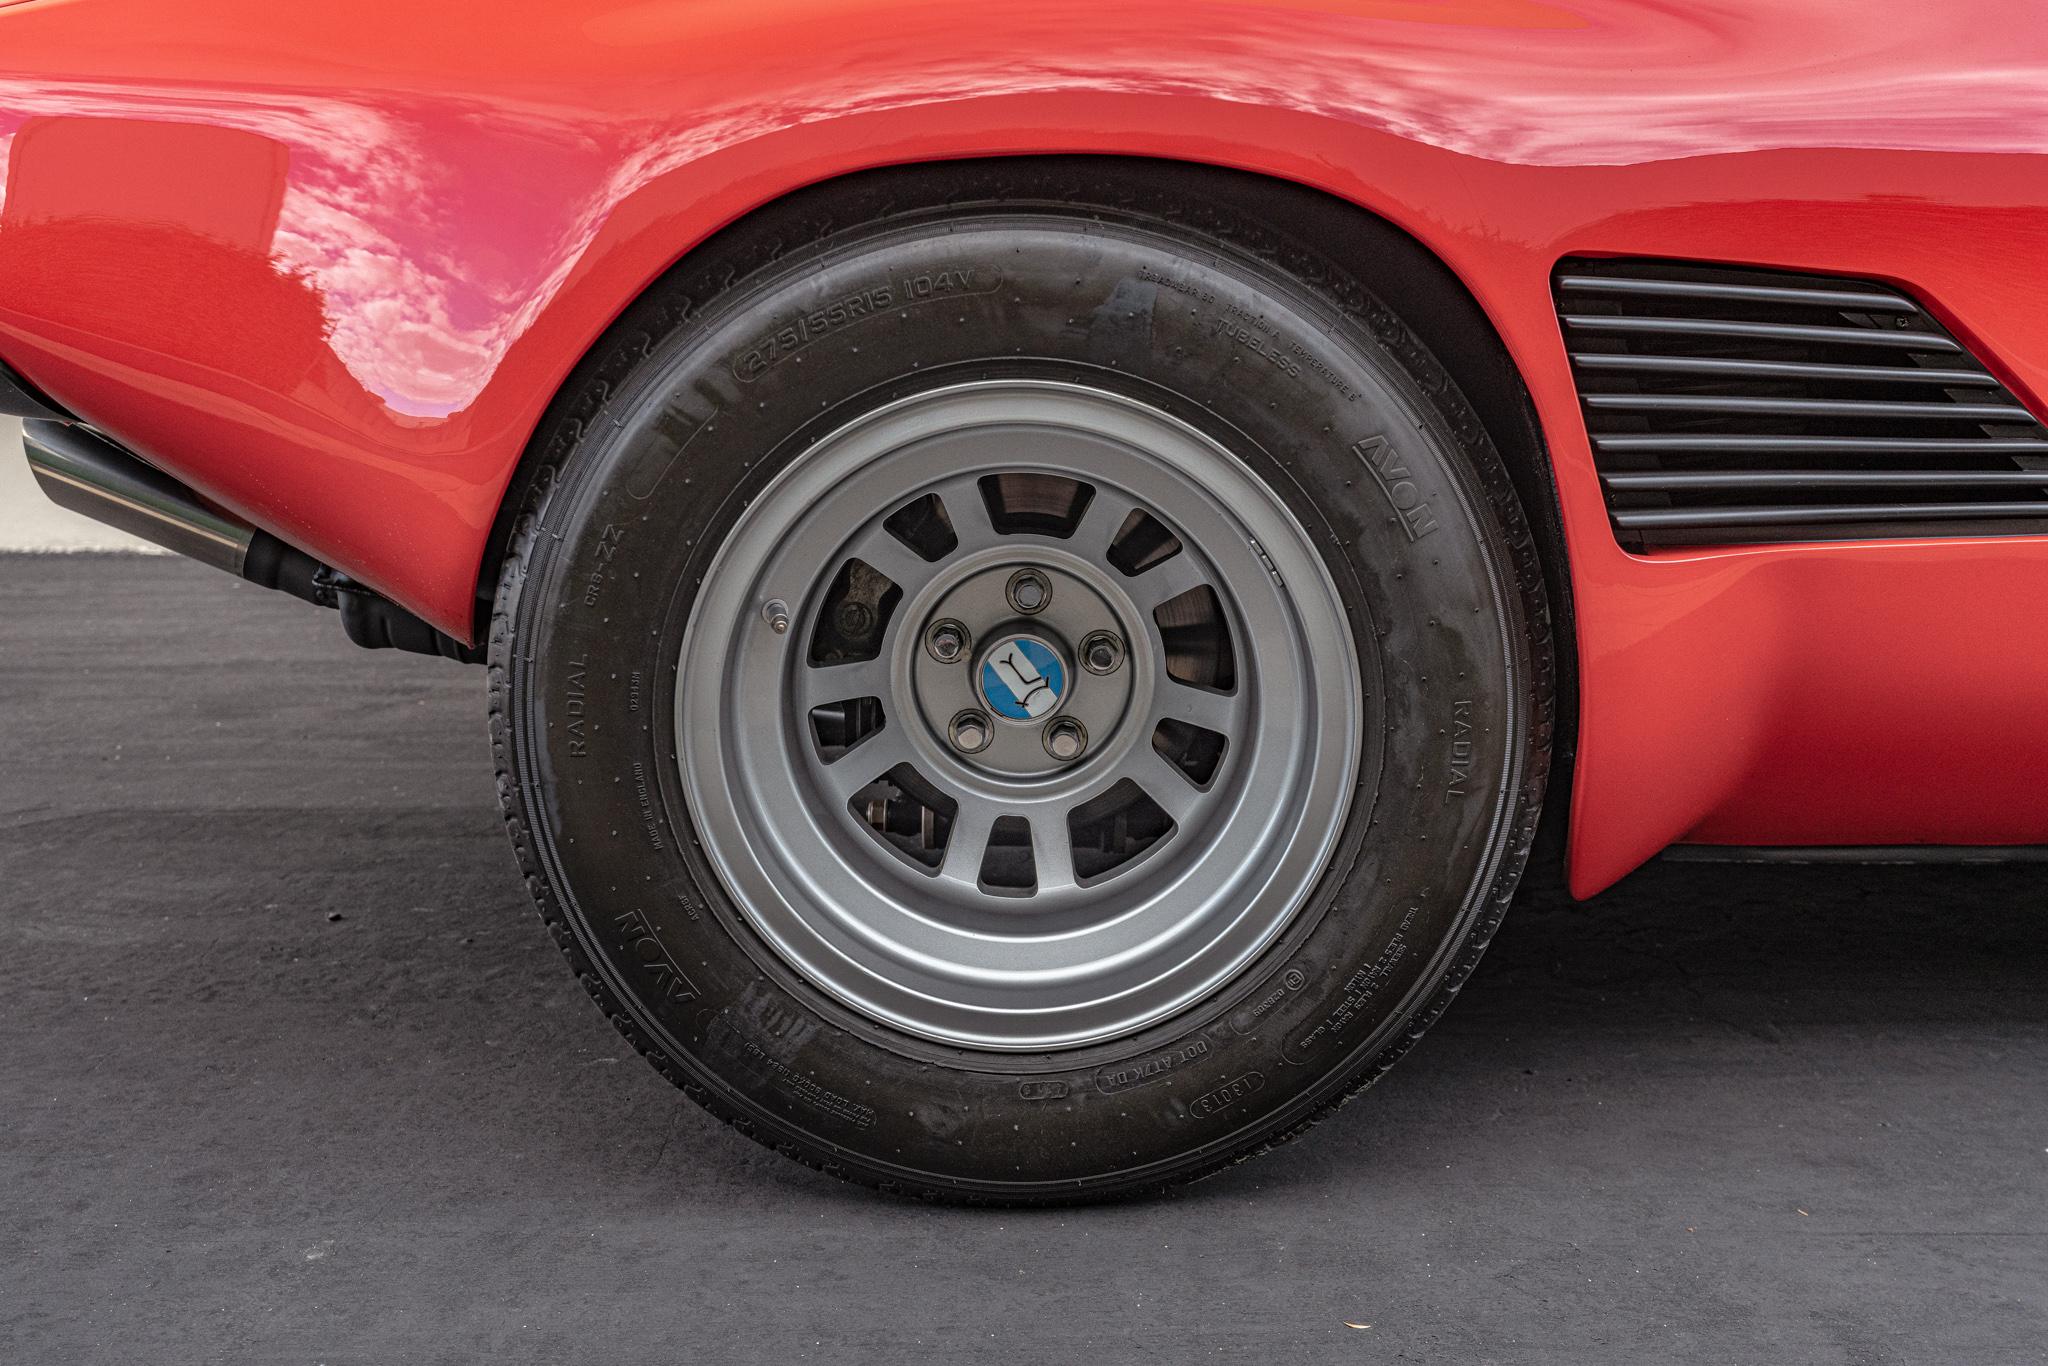 1989 Detomaso Pantera GT5-S #9547